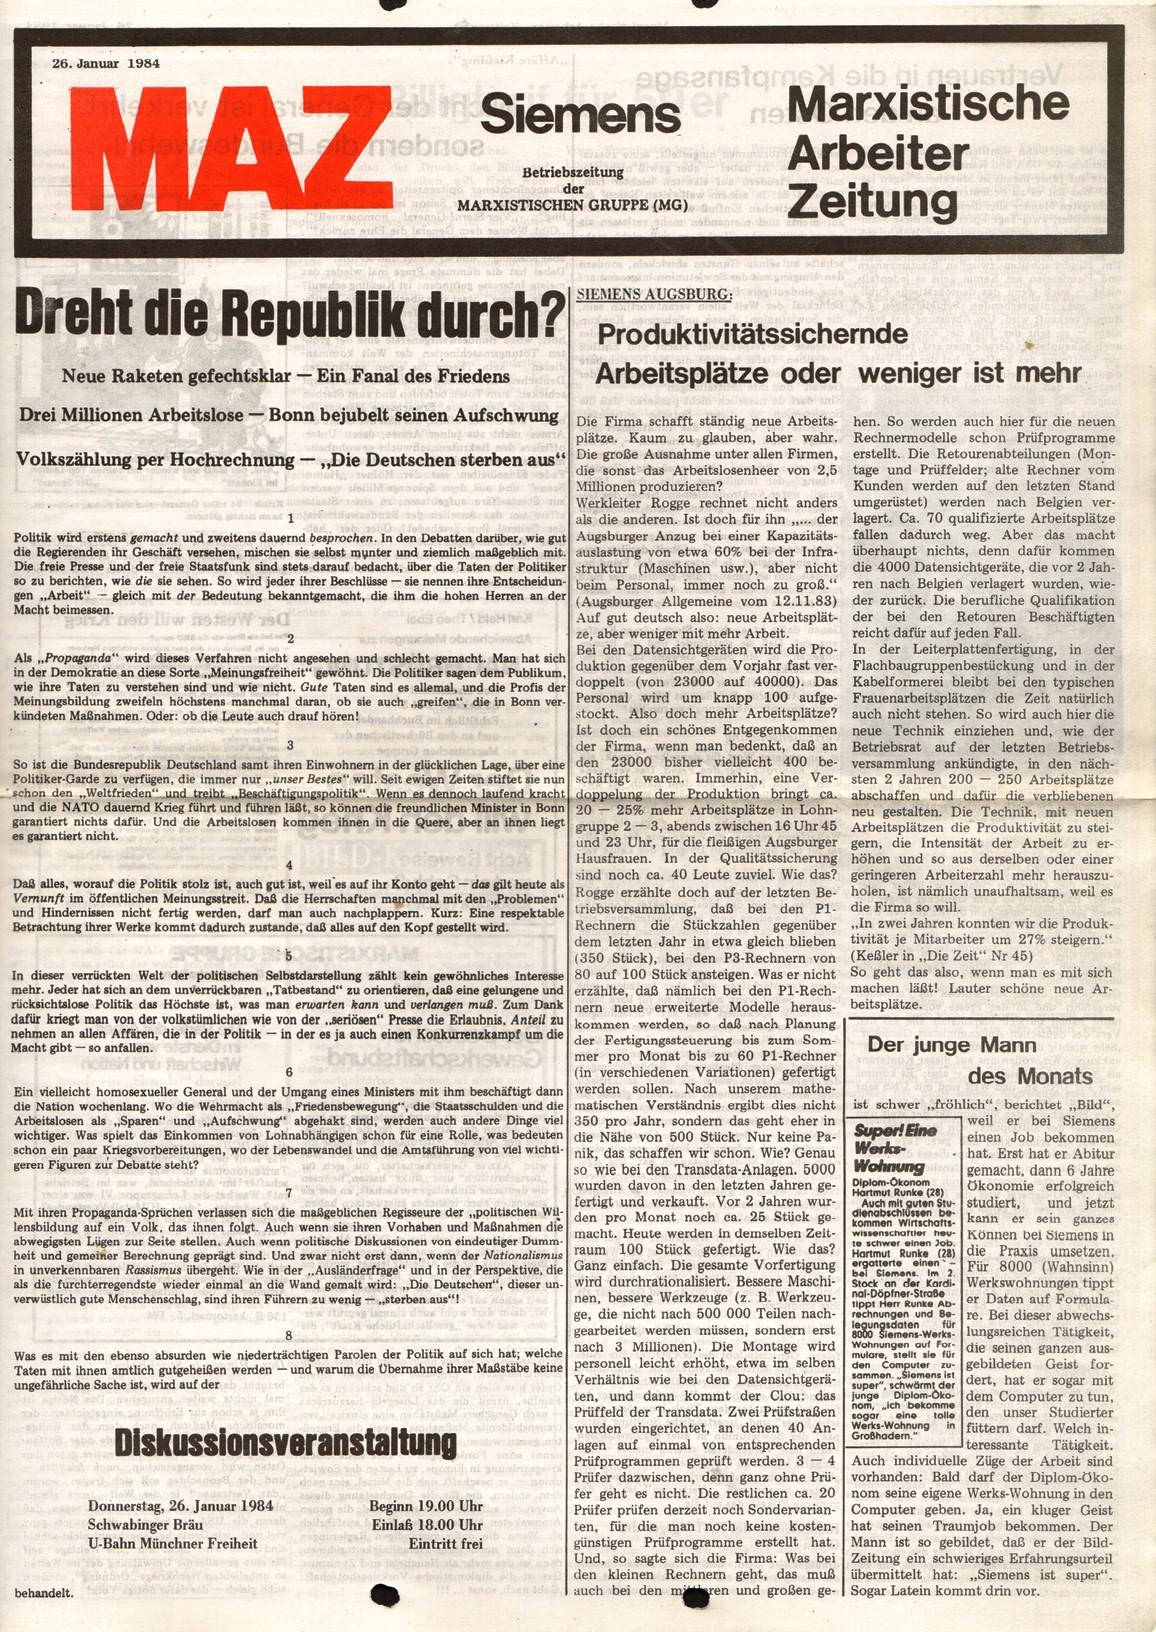 Muenchen_MG_MAZ_Siemens_19840126_01